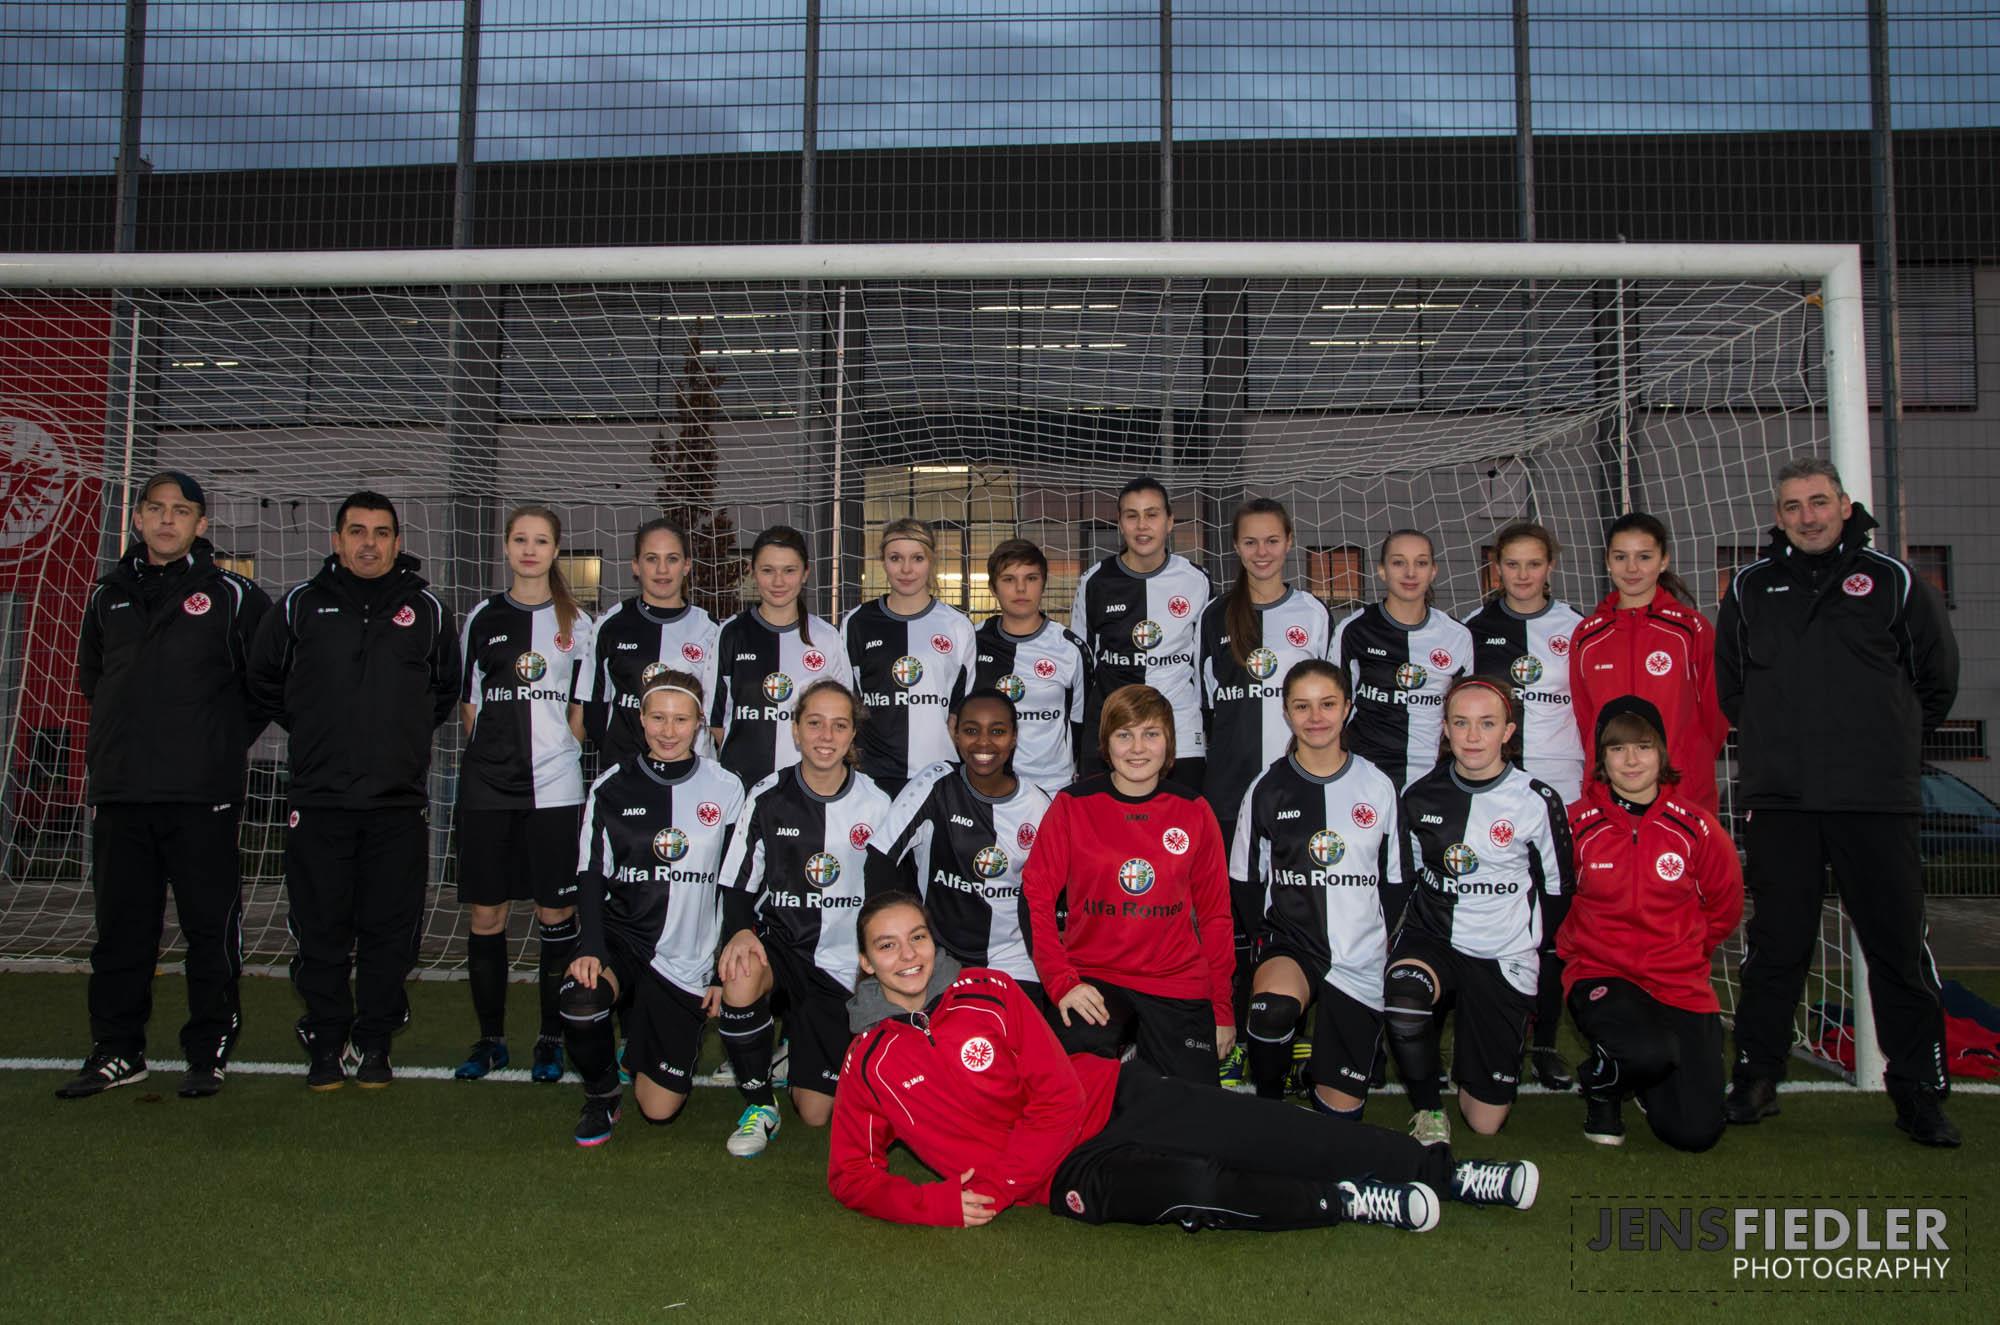 U17 Eintracht Frankfurt